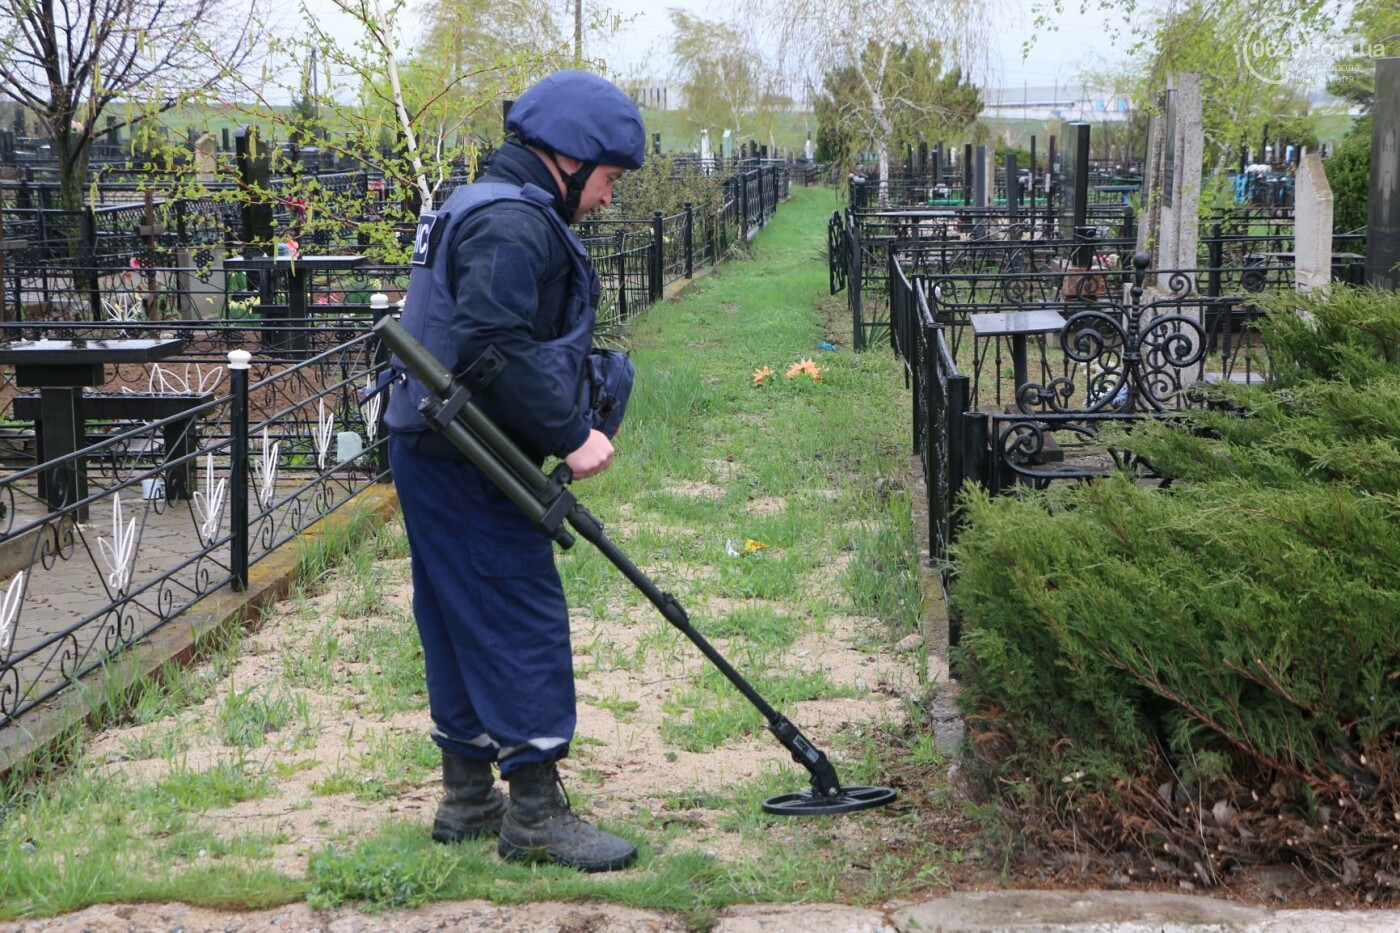 Пиротехники начали проверять безопасность кладбищ Мариуполя,- ФОТО, ВИДЕО, фото-1